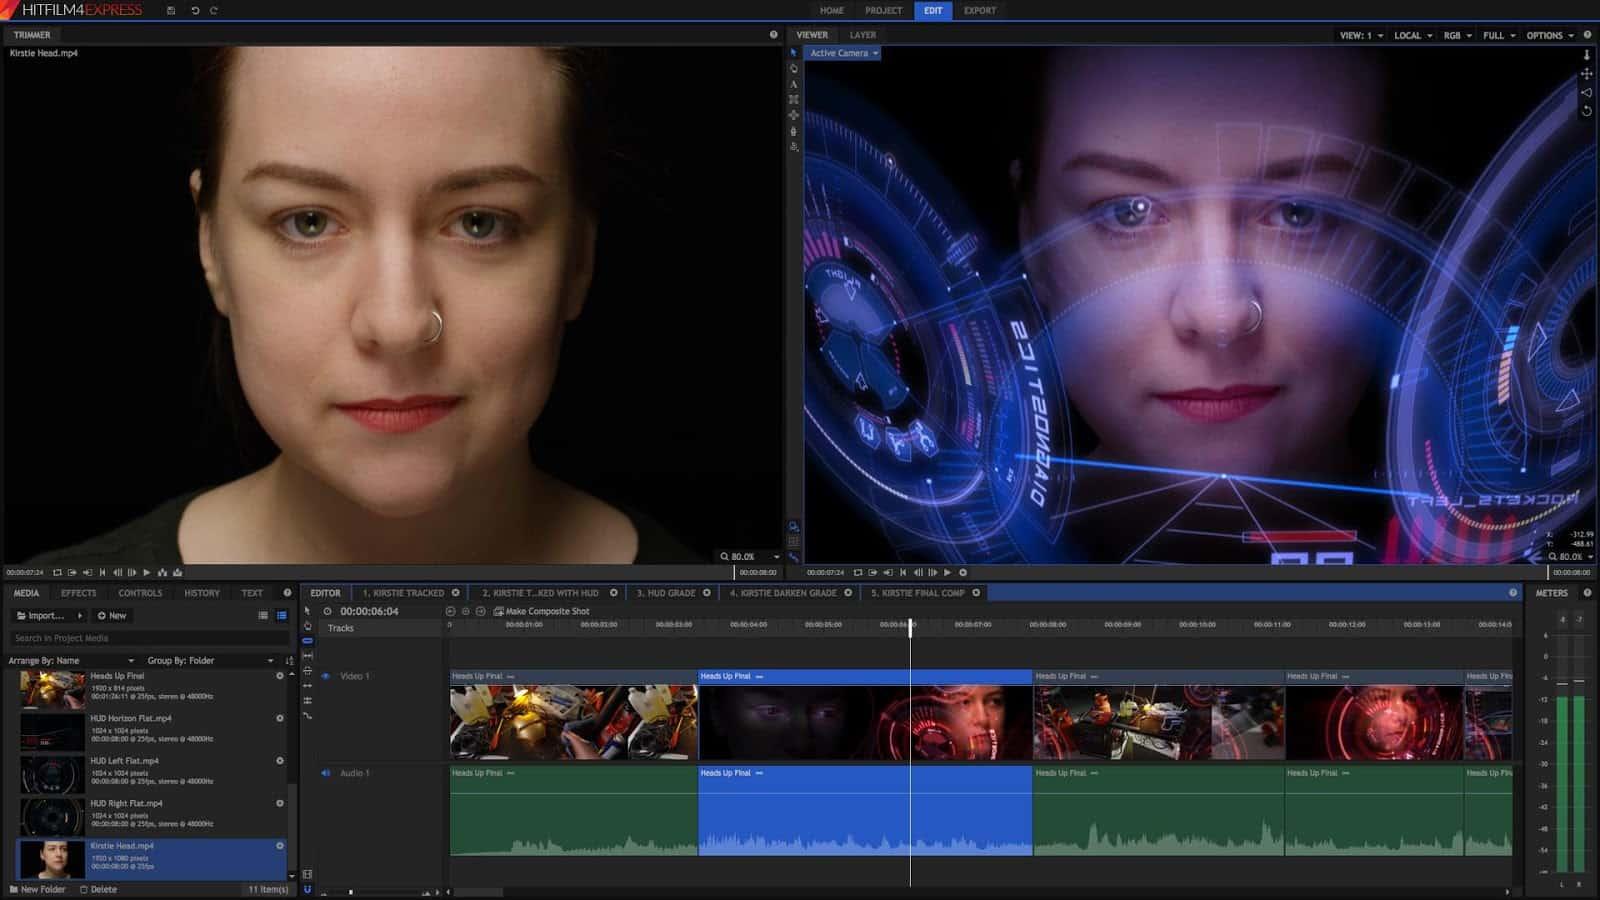 Phần mềm HitFilm Express